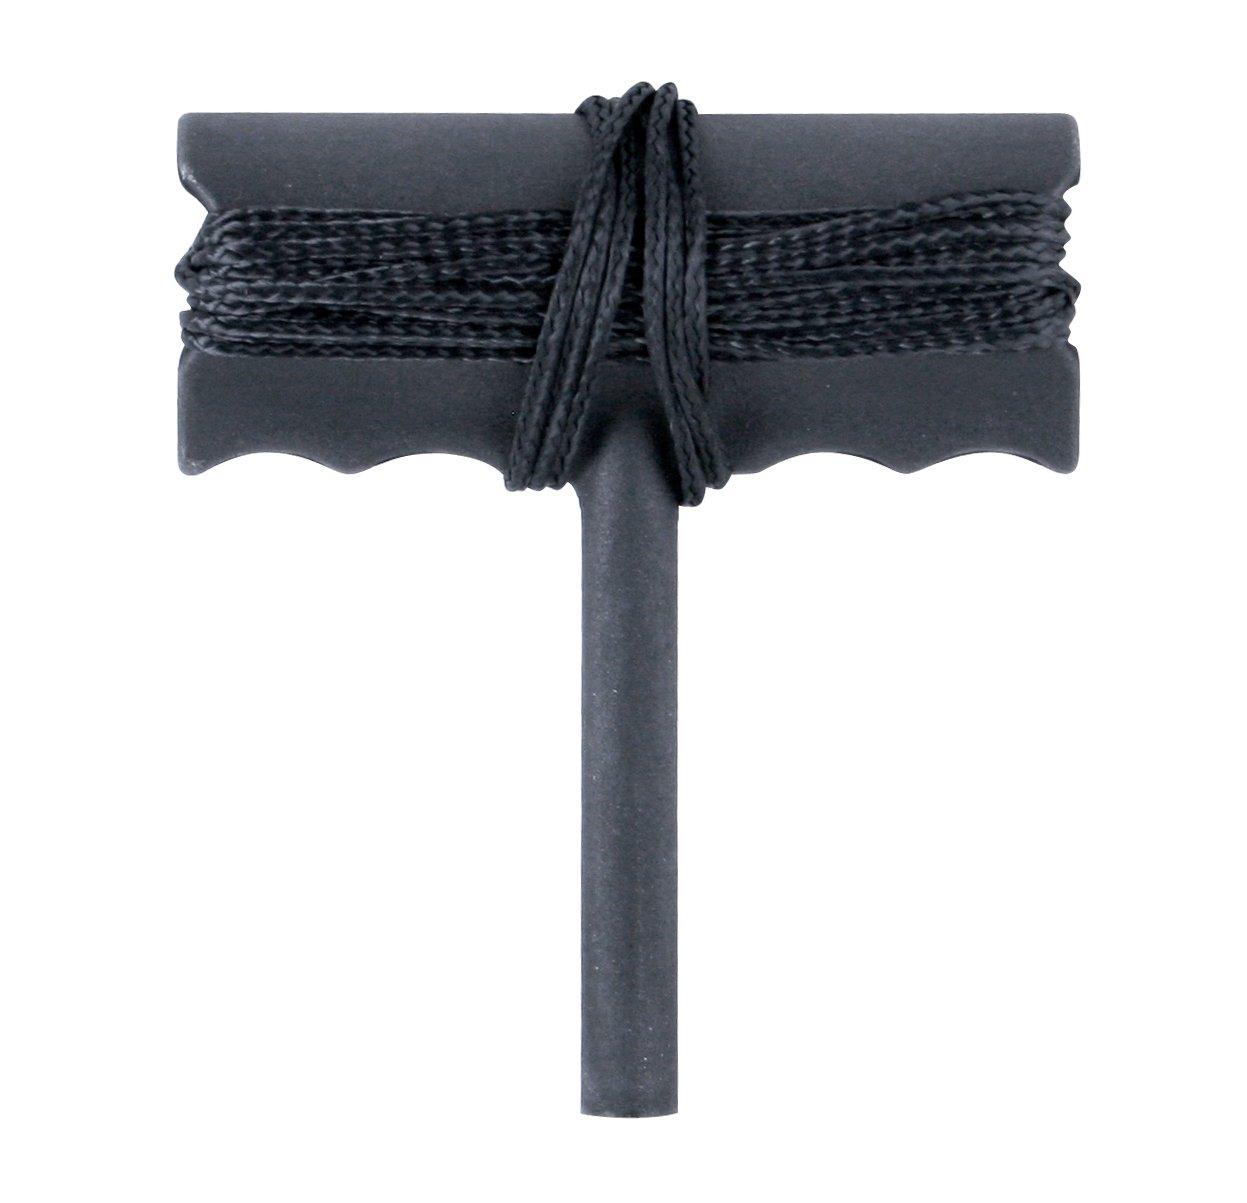 Rob Allen Wishbone Tool - Glass Nylon